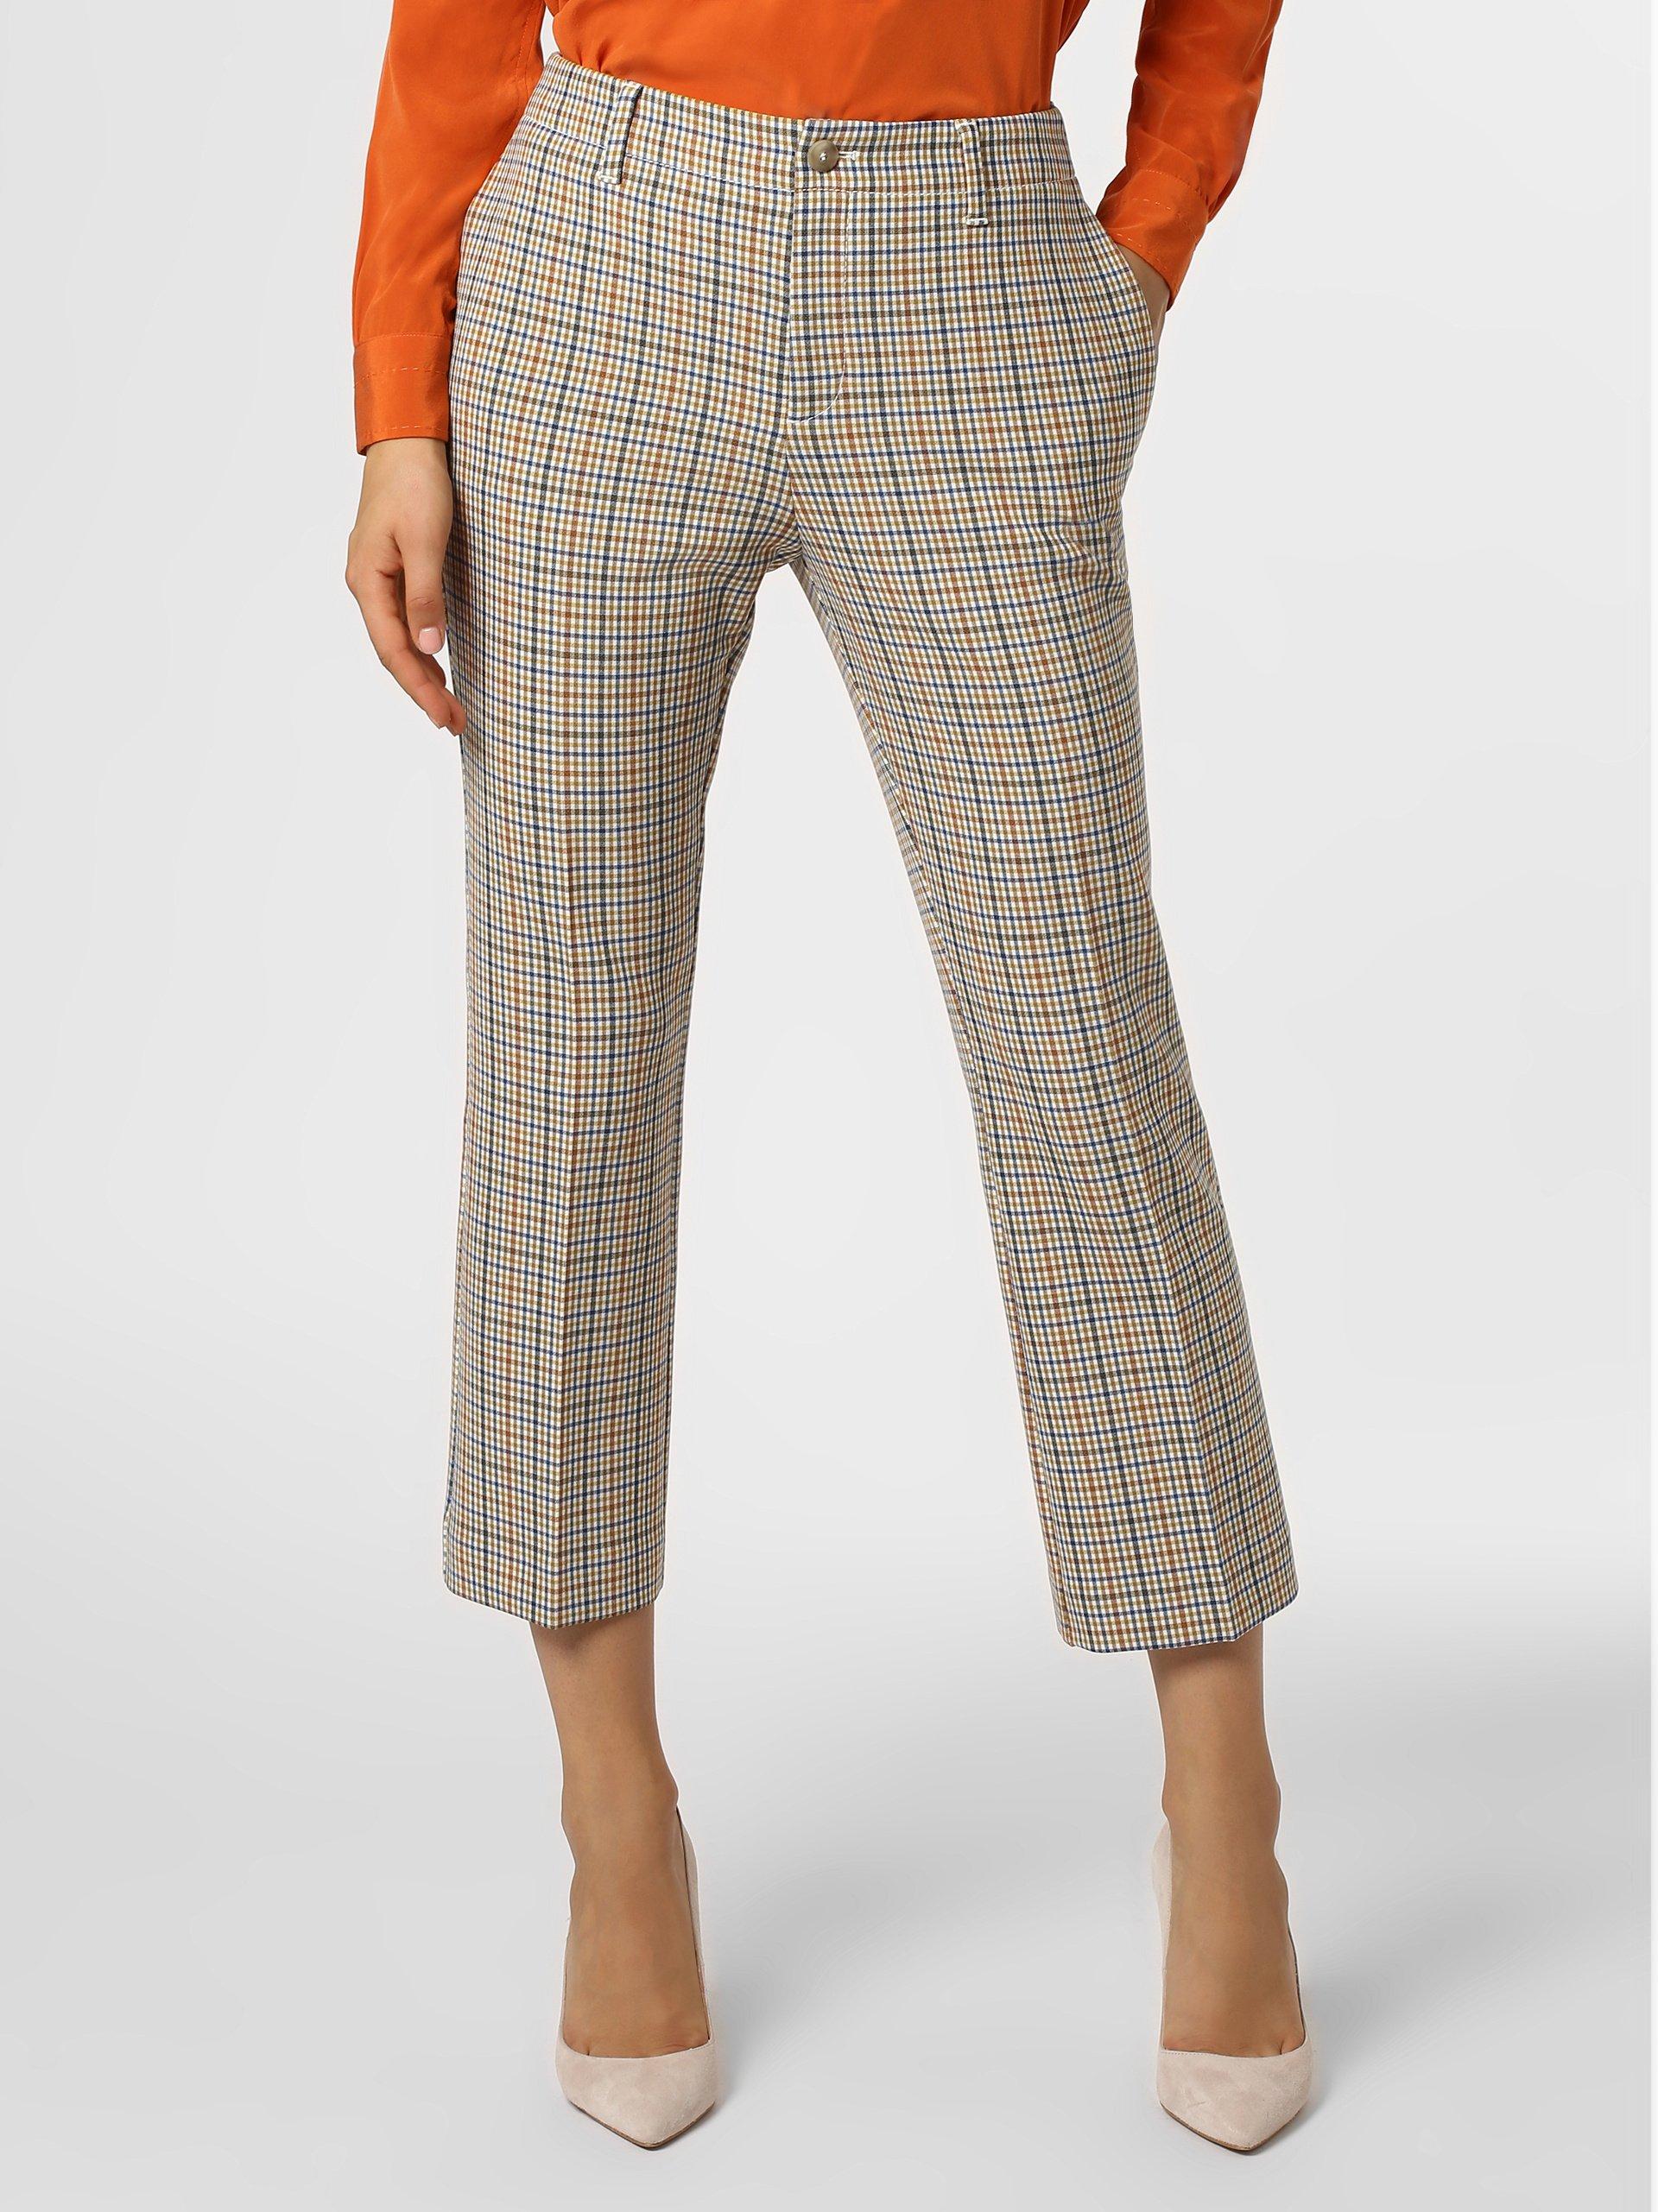 BOSS Casual Spodnie damskie – Sacaro